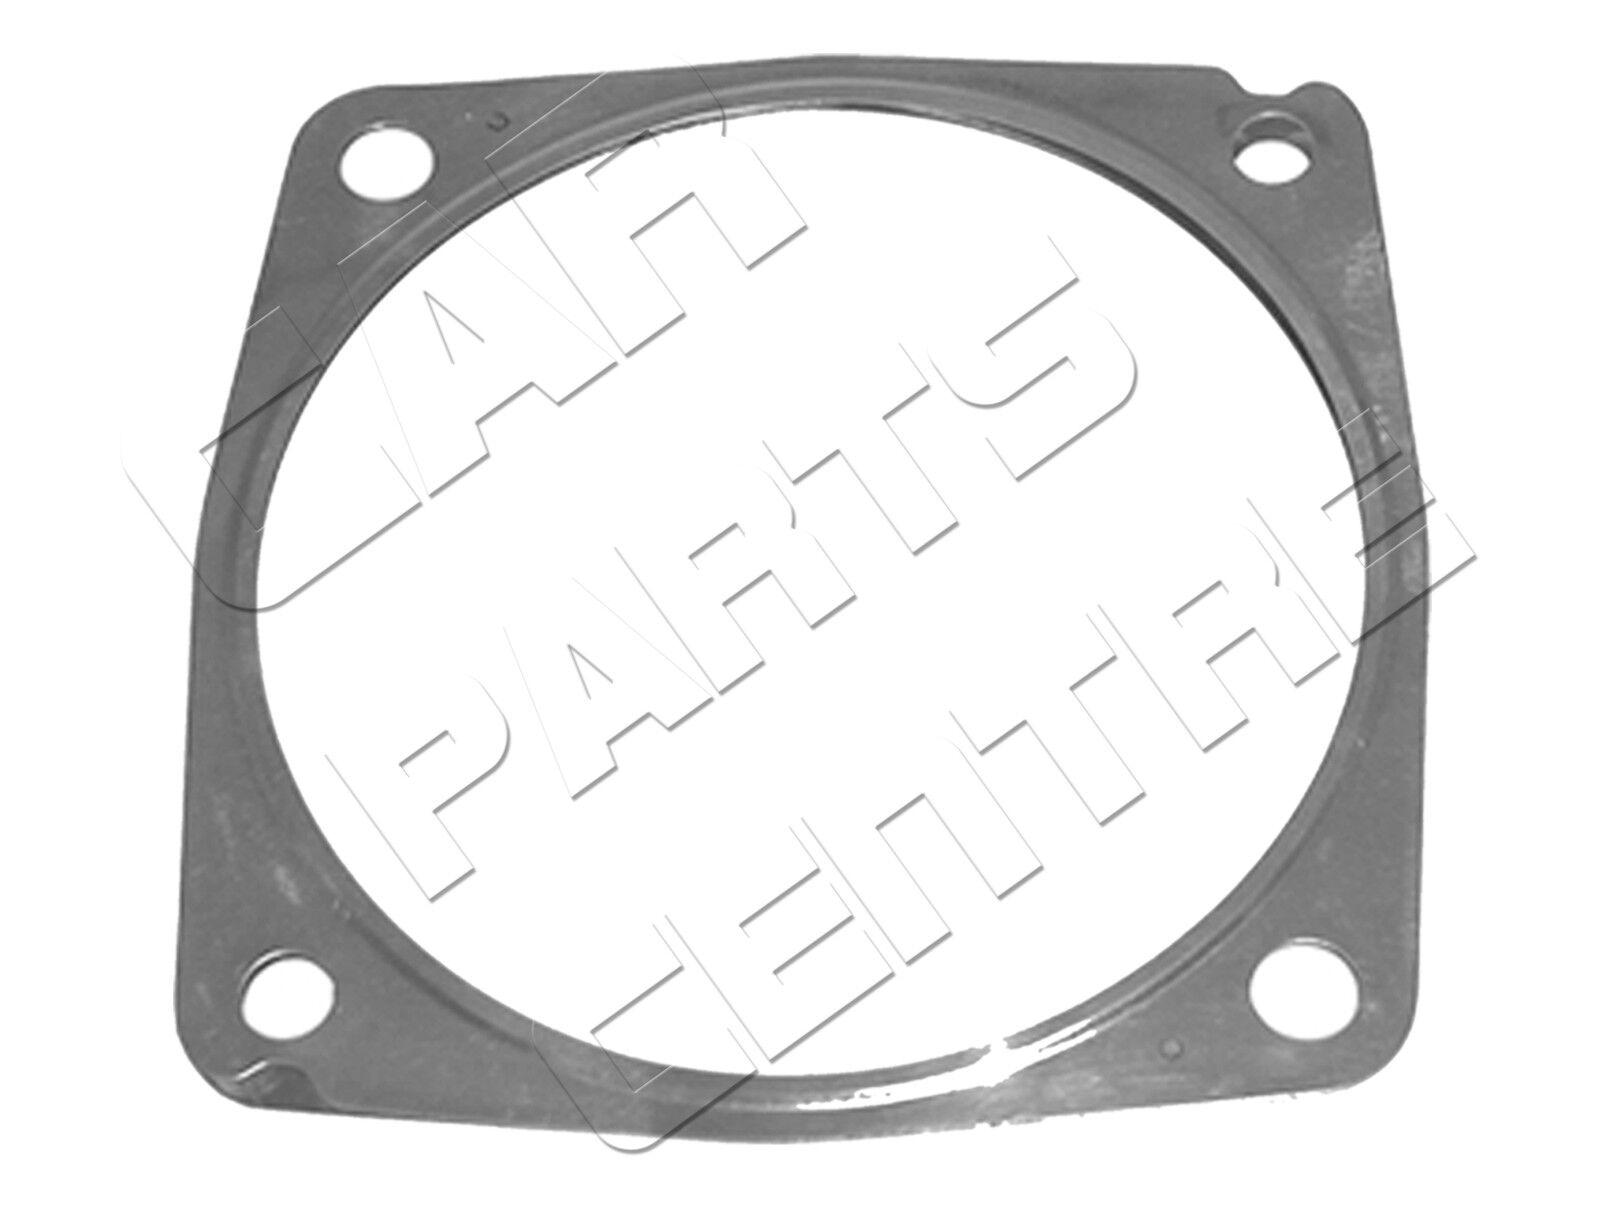 FOR PEUGEOT 307 2.0 HDi FRONT EXHAUST CATALYTIC CONVERTER 110 Bhp DIESEL GASKET